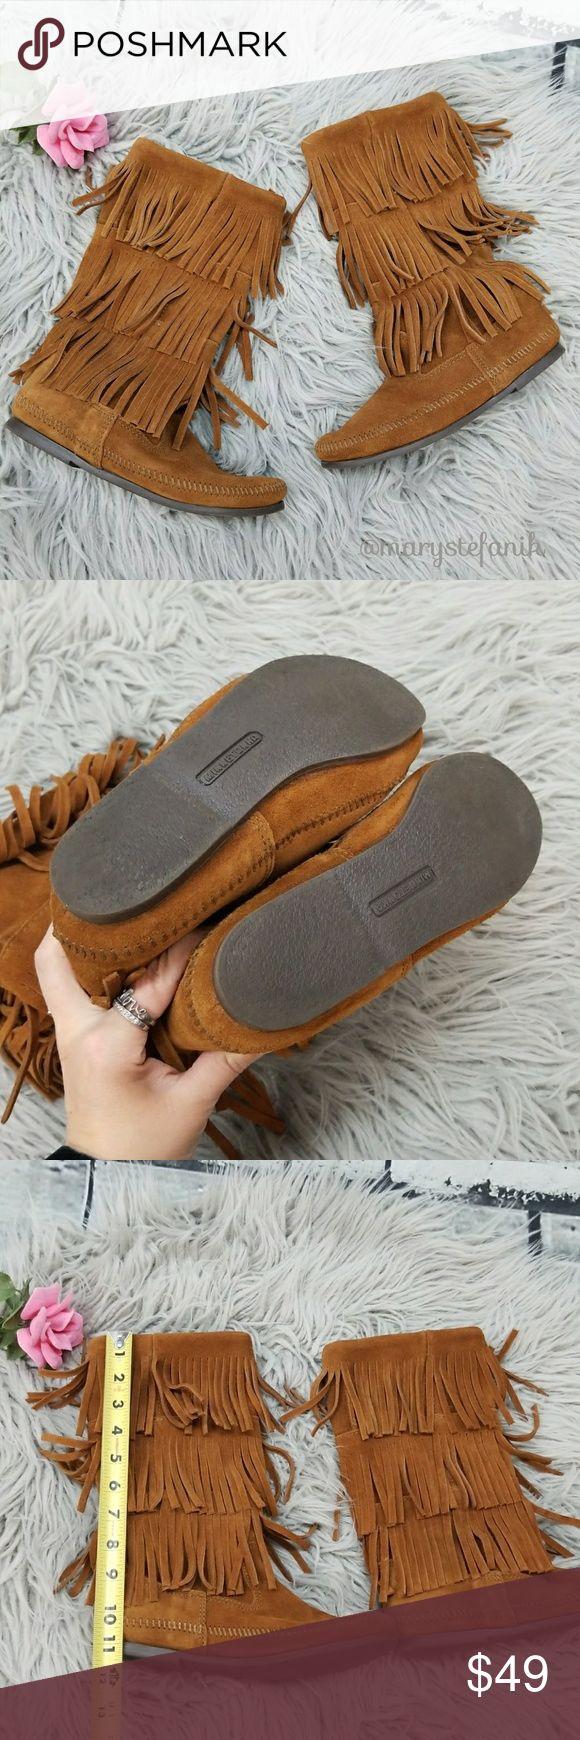 best 25+ minnetonka shoes ideas on pinterest | mocassin shoes, how